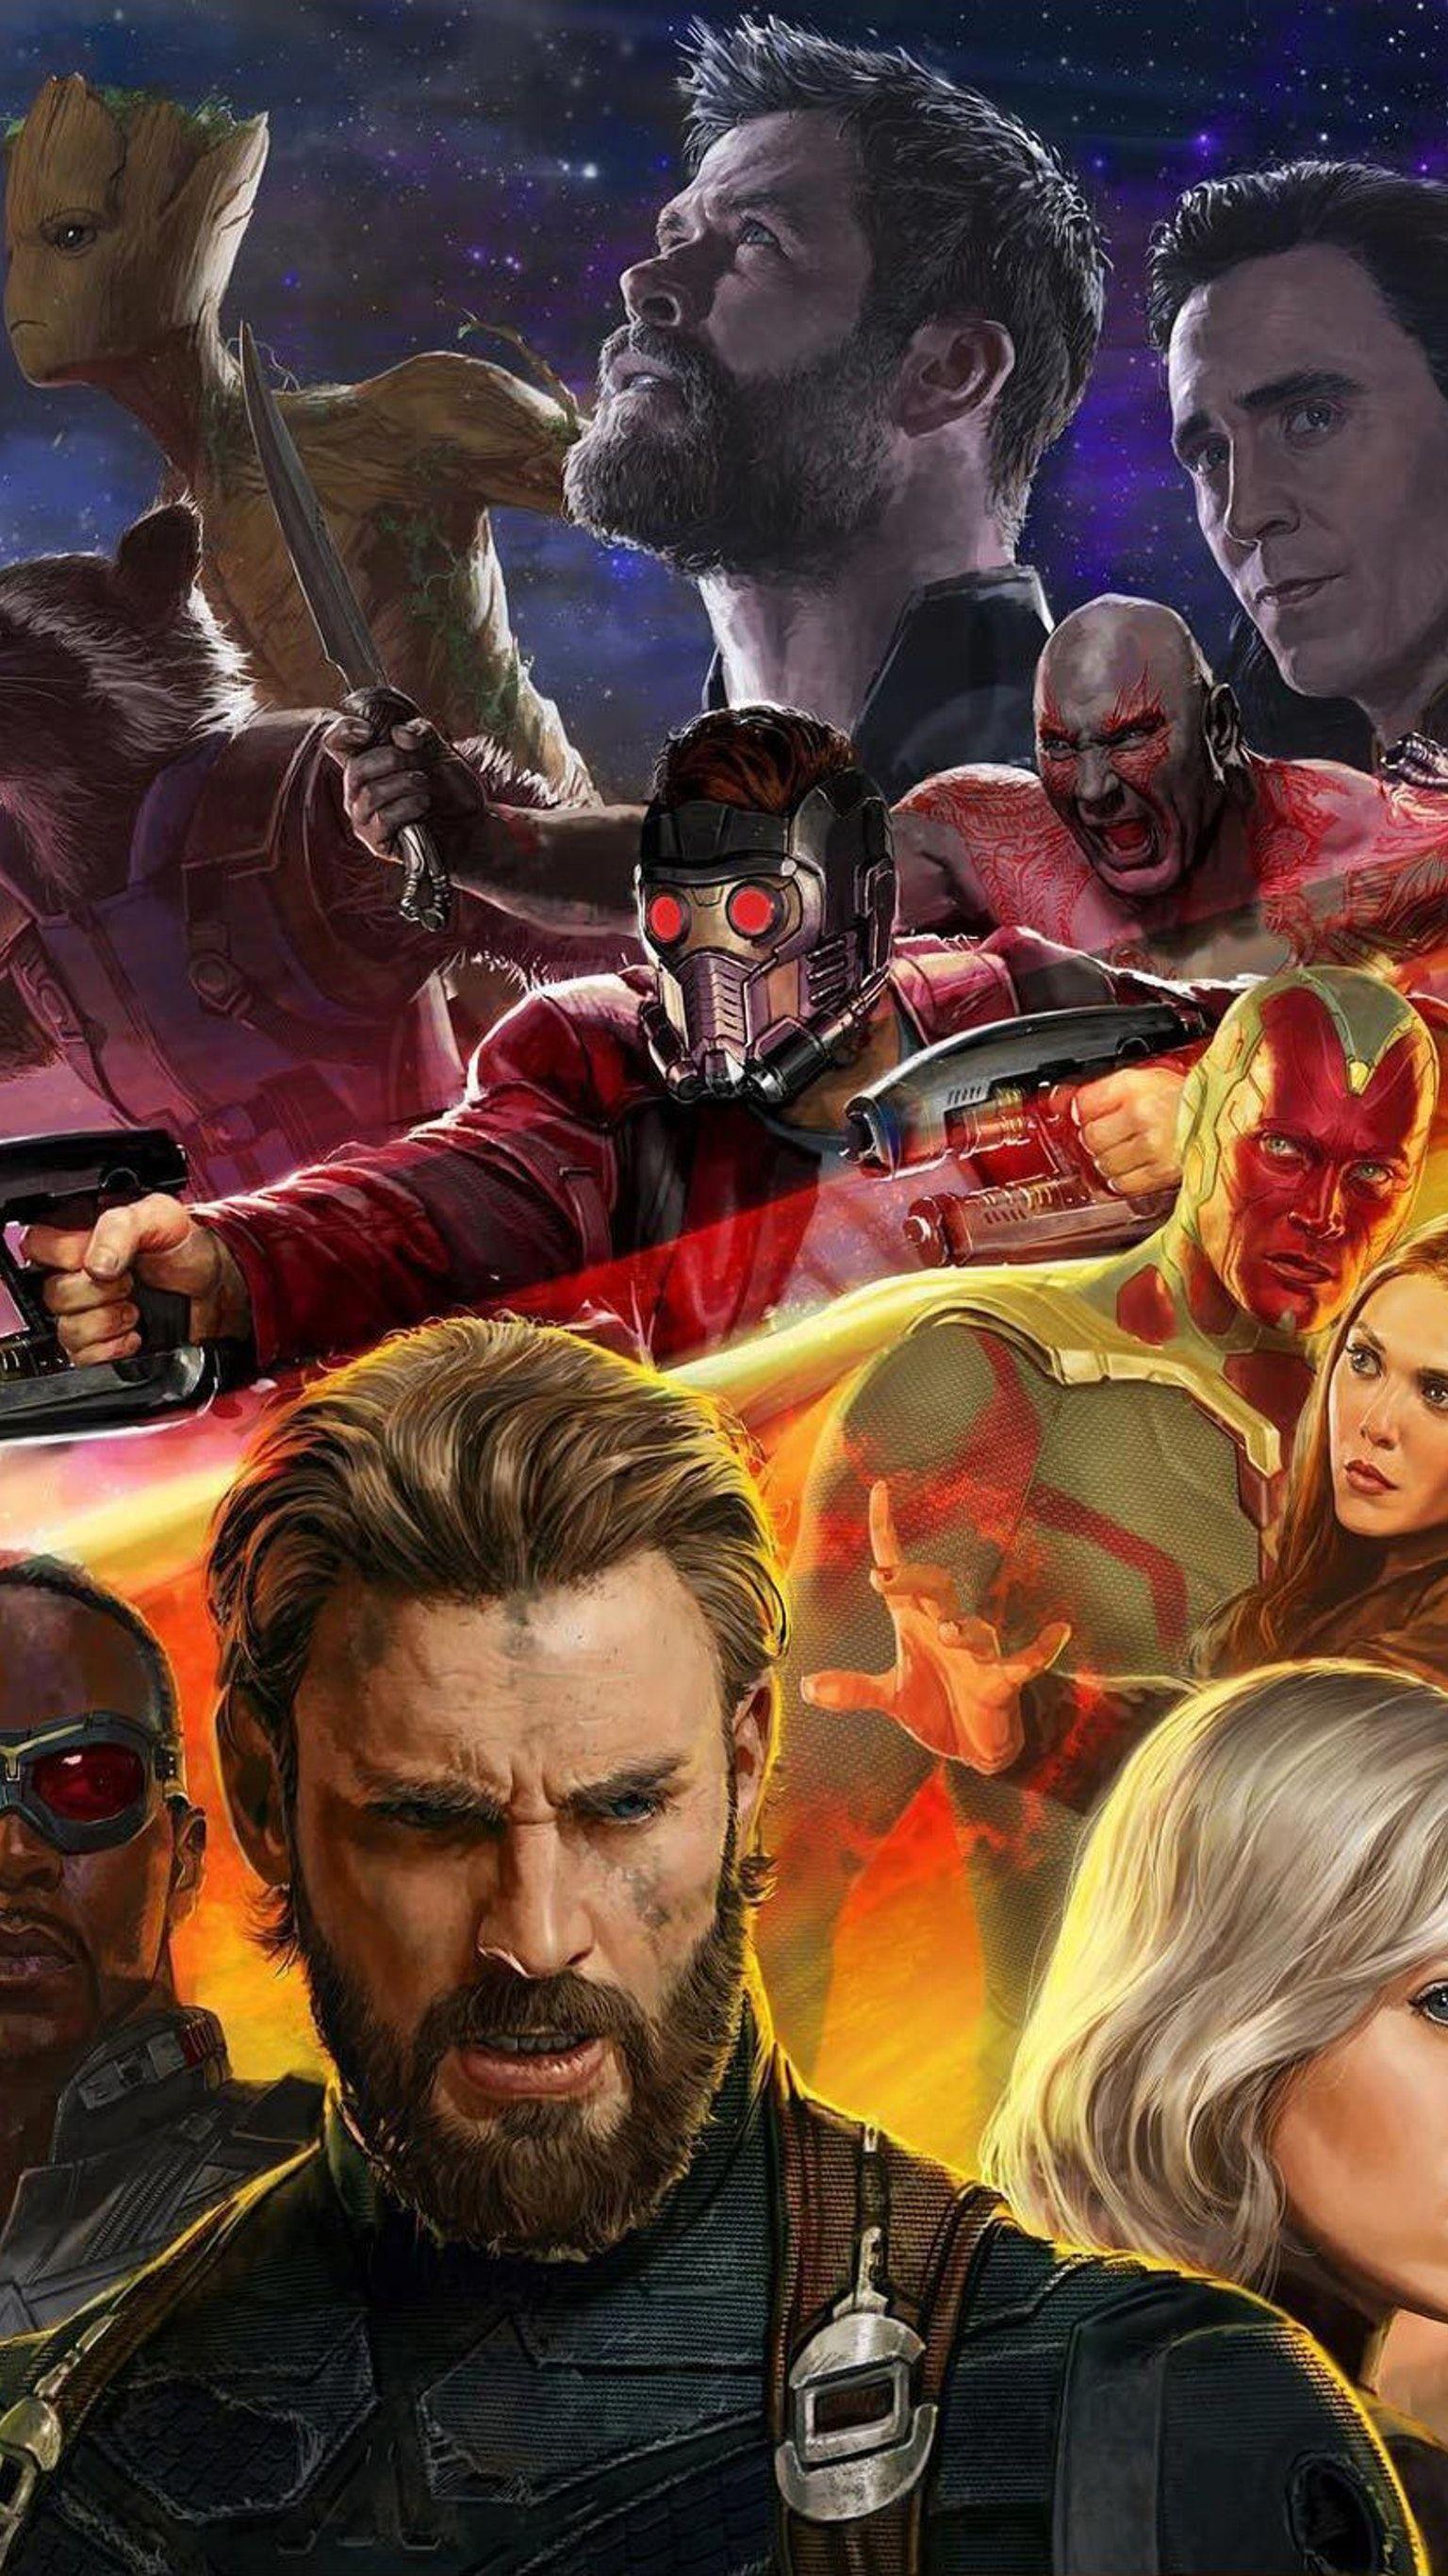 Great Vision Wanda Infinity War Wallpaper - d7b16ce73bea56877381a365ff7bf36d  Photograph_12489 .jpg